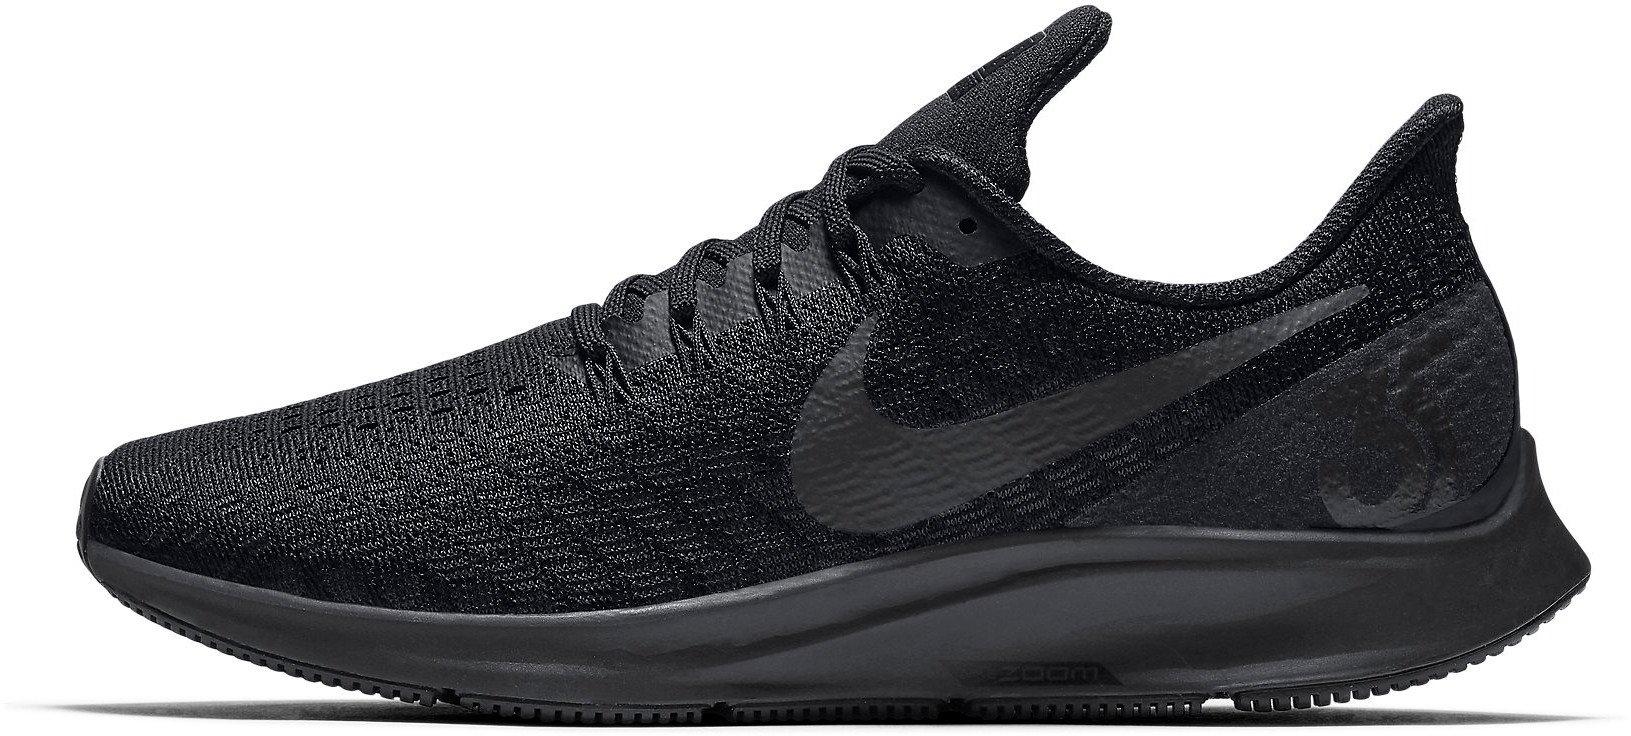 Chaussures de running Nike WMNS AIR ZOOM PEGASUS 35